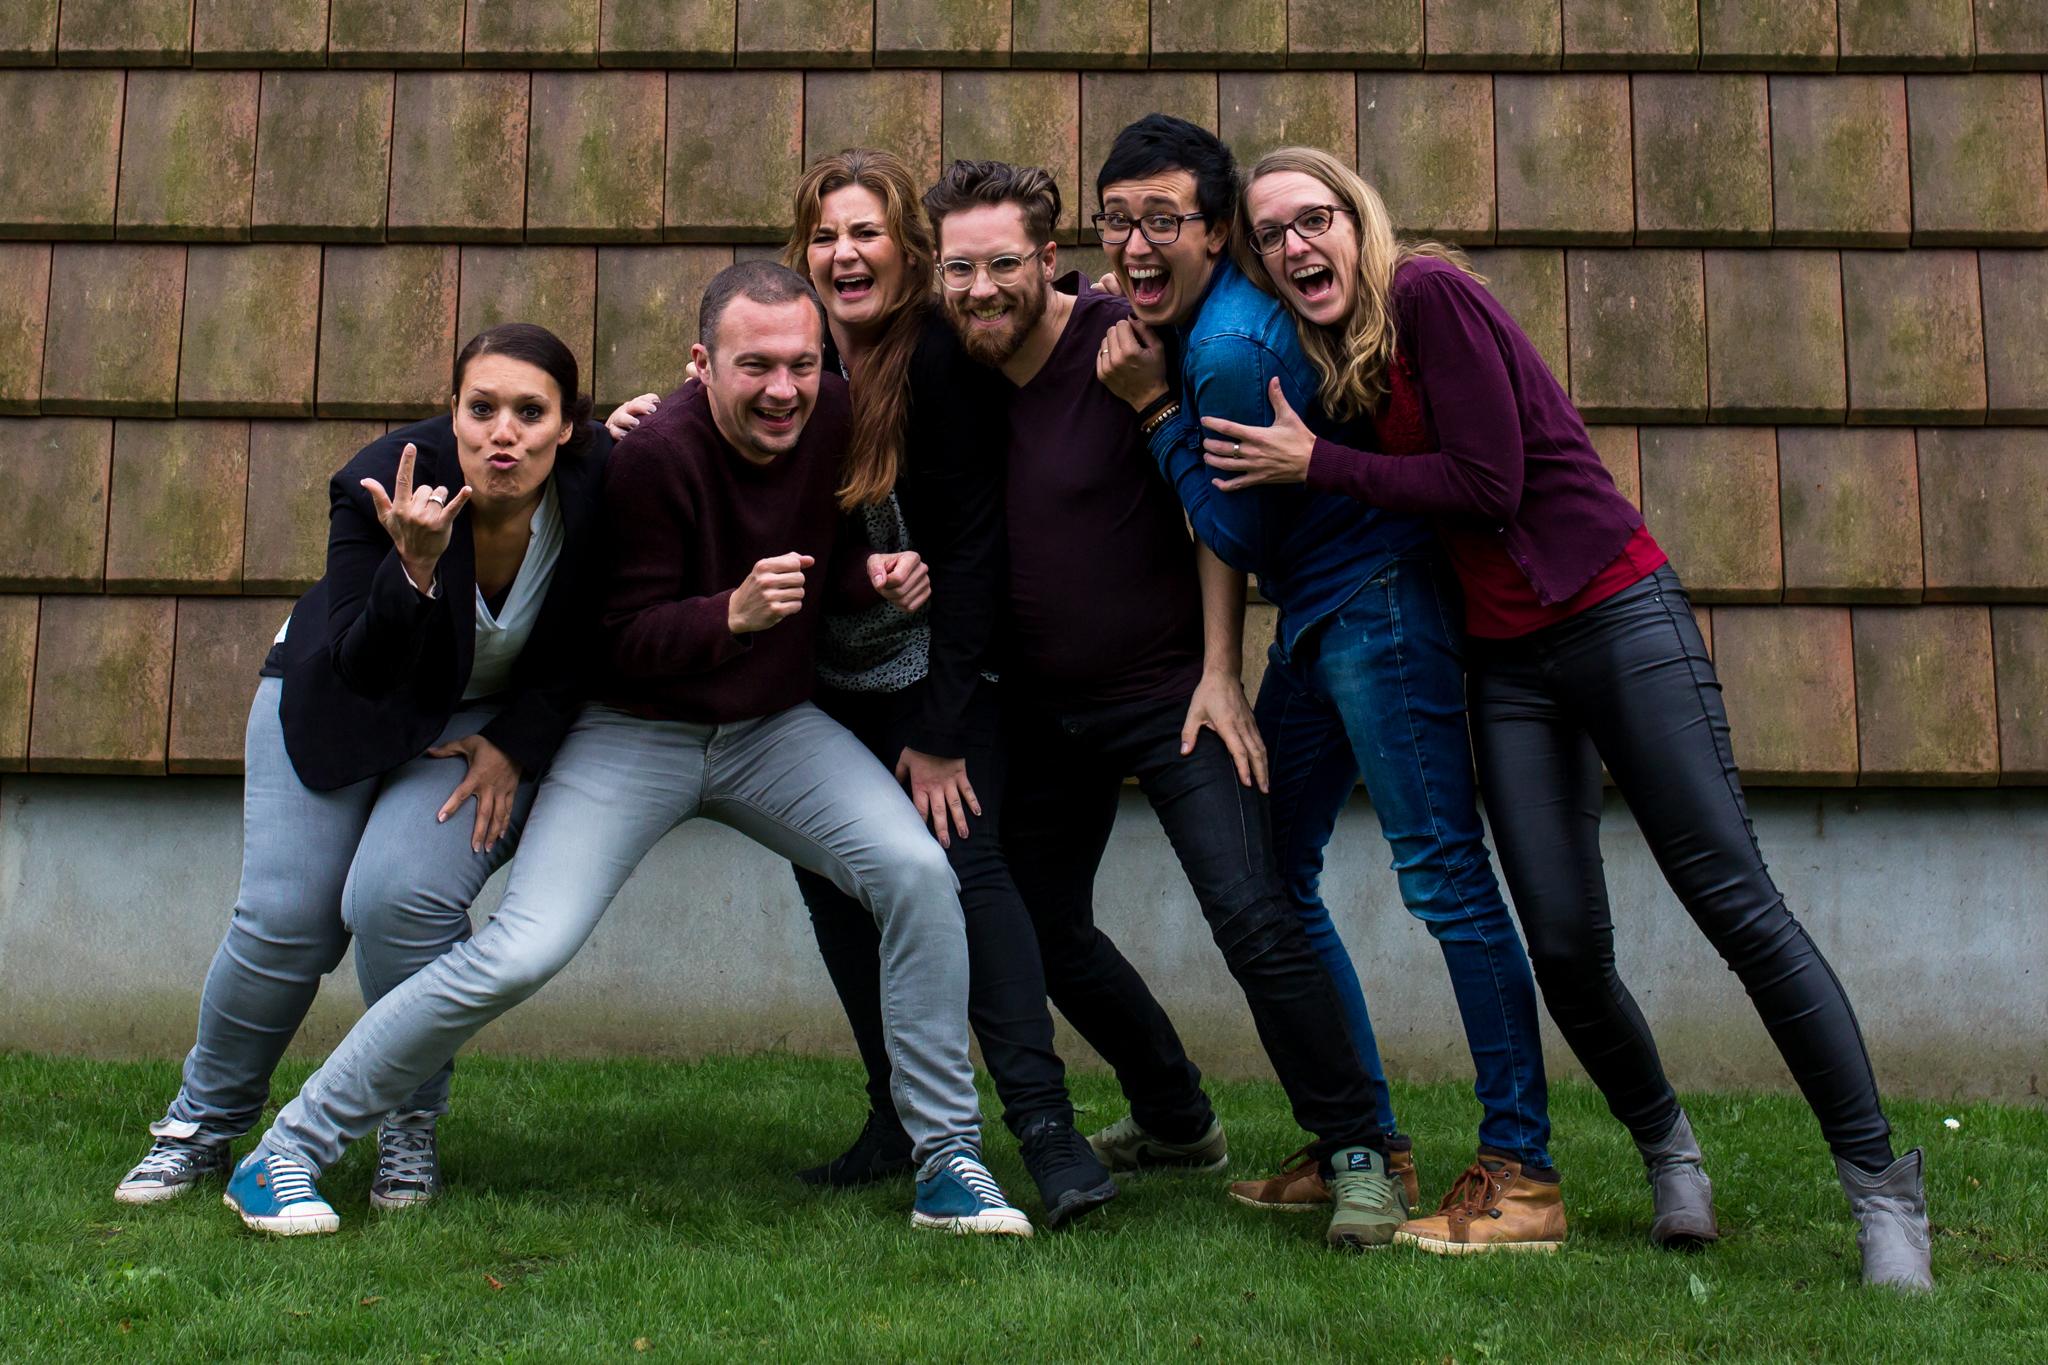 6 groepsfoto - Get Real Workshop 2 - Marieke Zwartscholten fotografie - web - 024